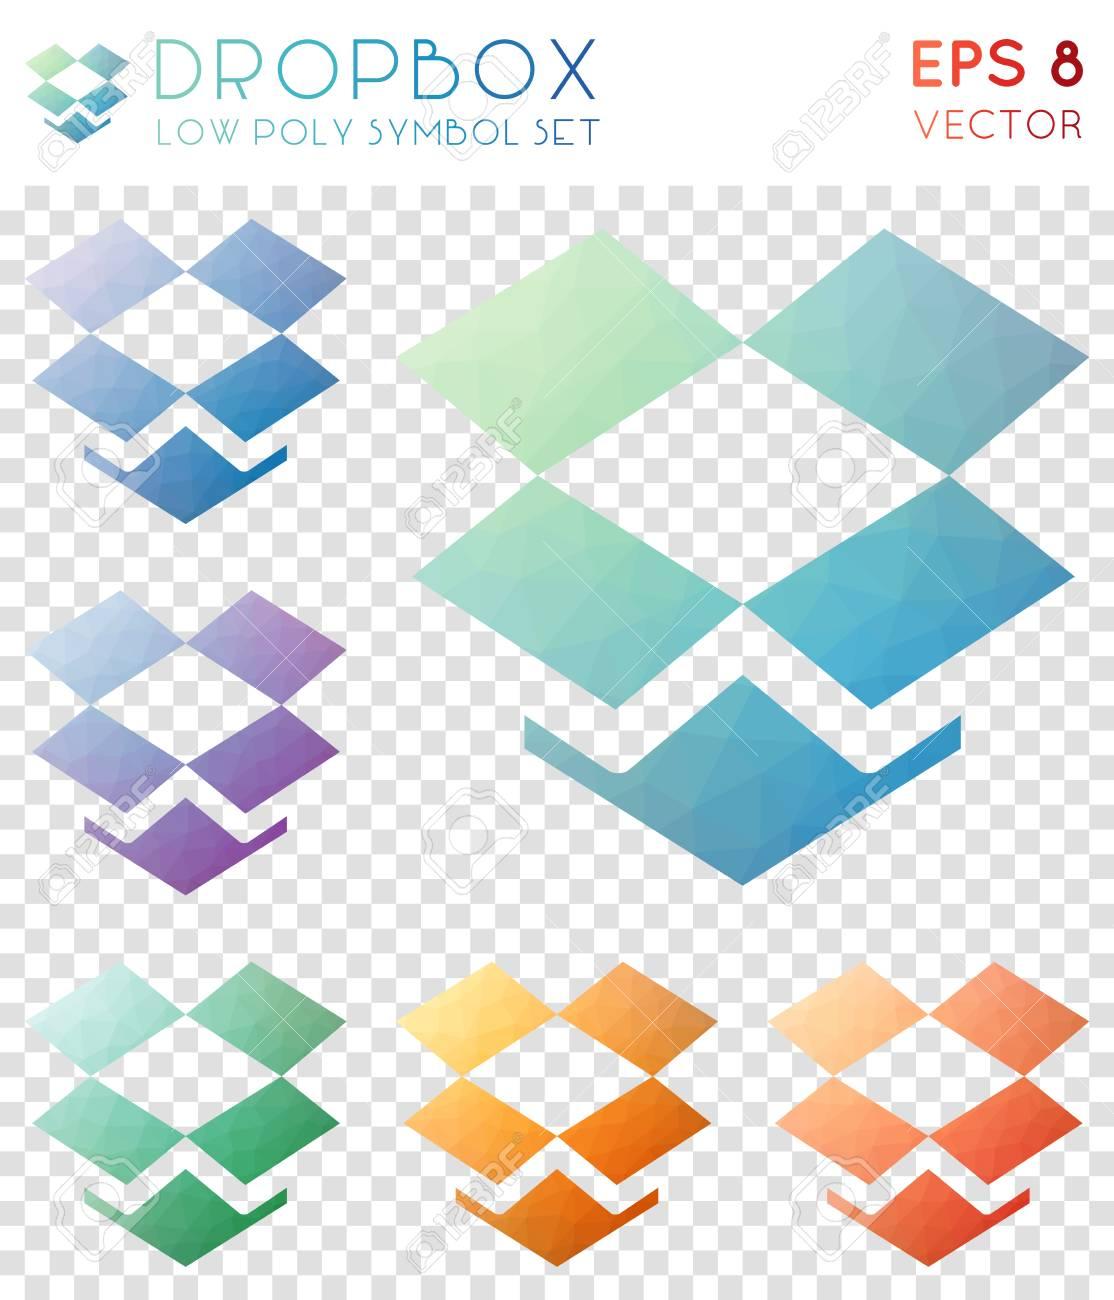 Dropbox Geometric Polygonal Icons Appealing Mosaic Style Symbol